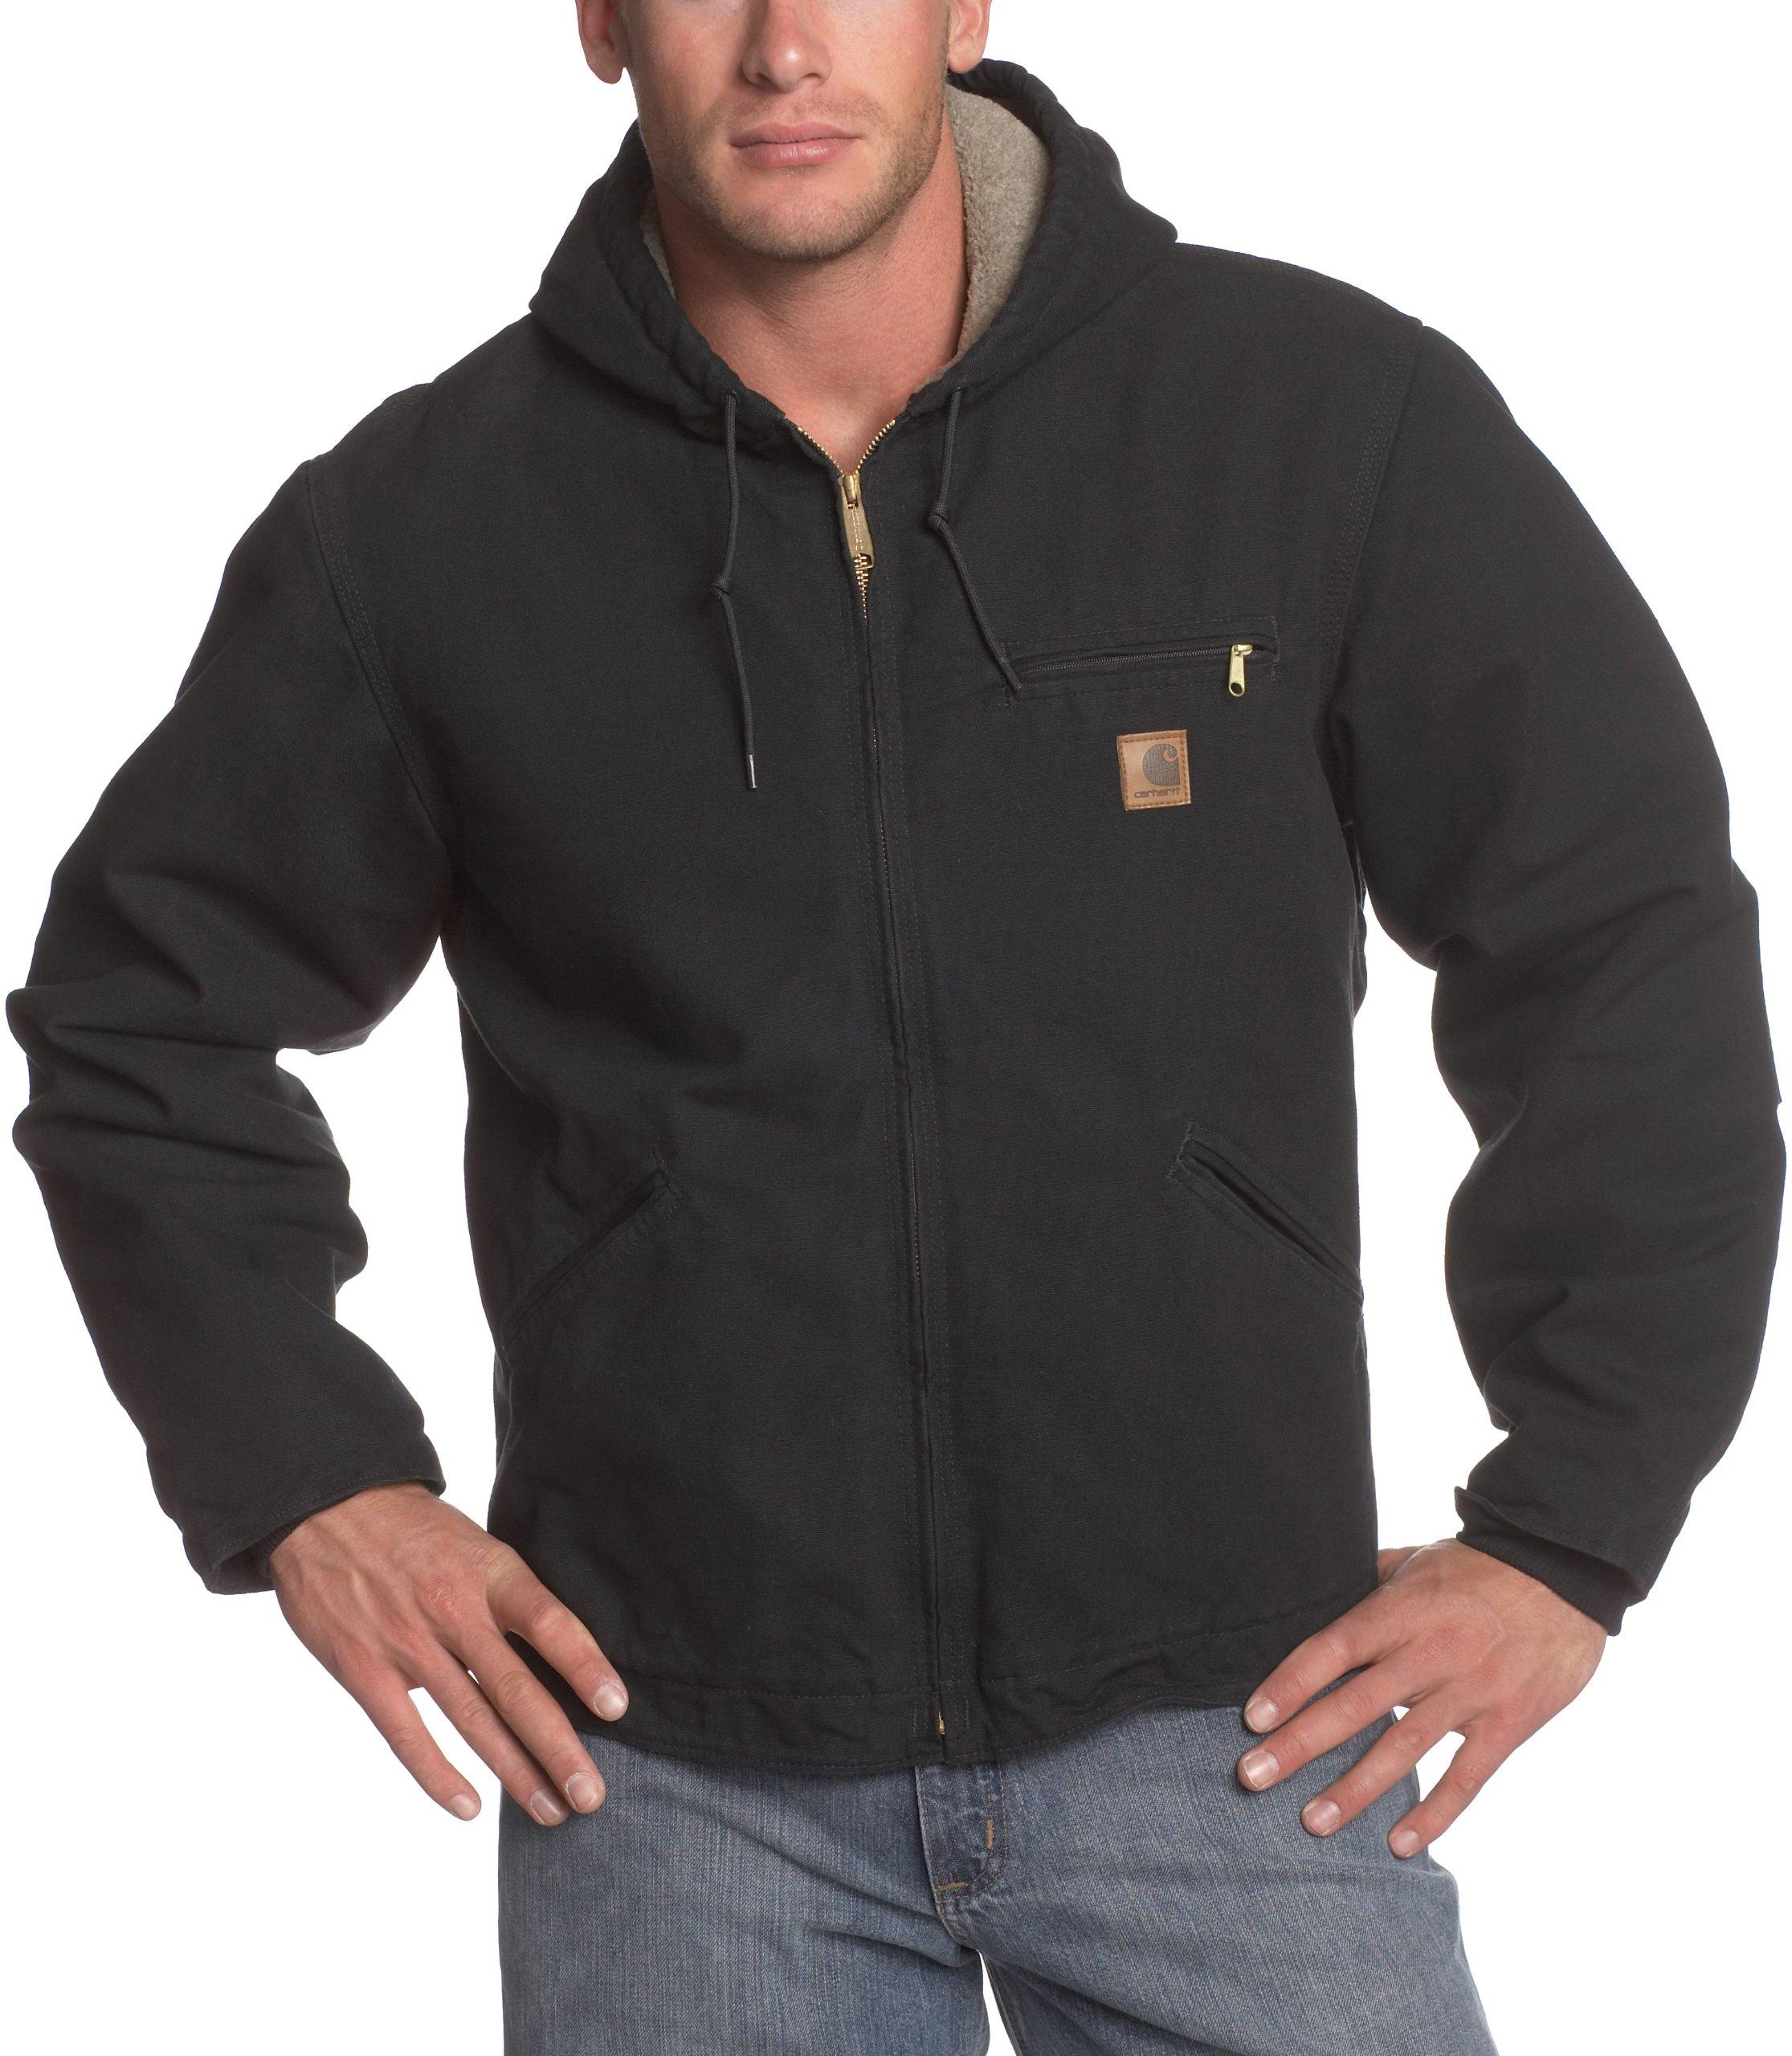 Carhartt Men's Big & Tall Sherpa Lined Sandstone Sierra Jacket J141,Black,Large Tall by Carhartt